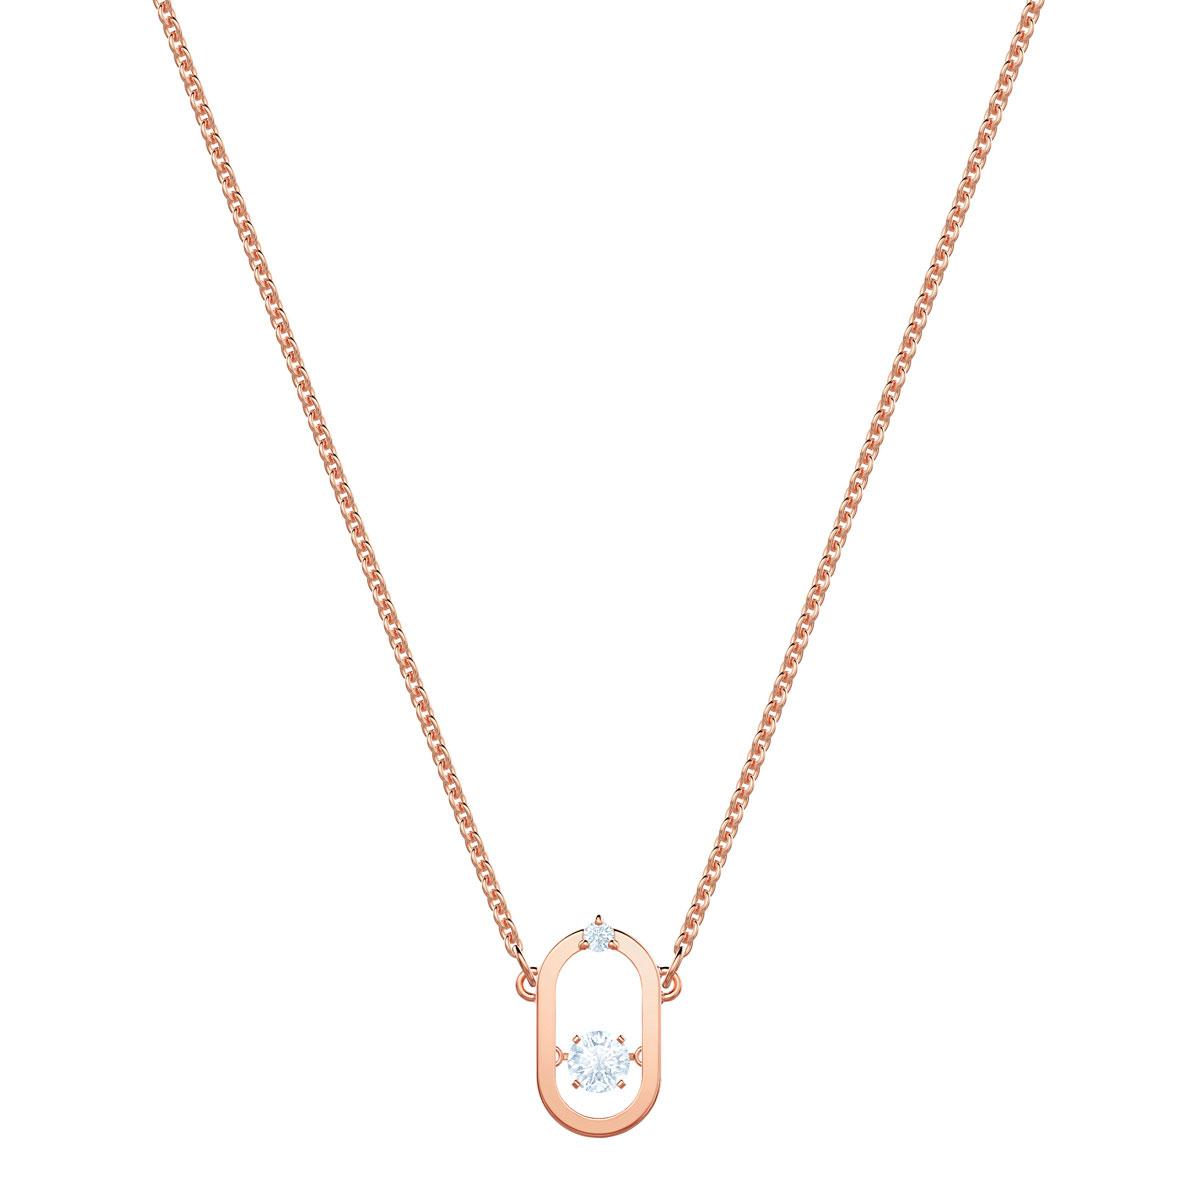 Swarovski North Necklace, White, Rose Gold